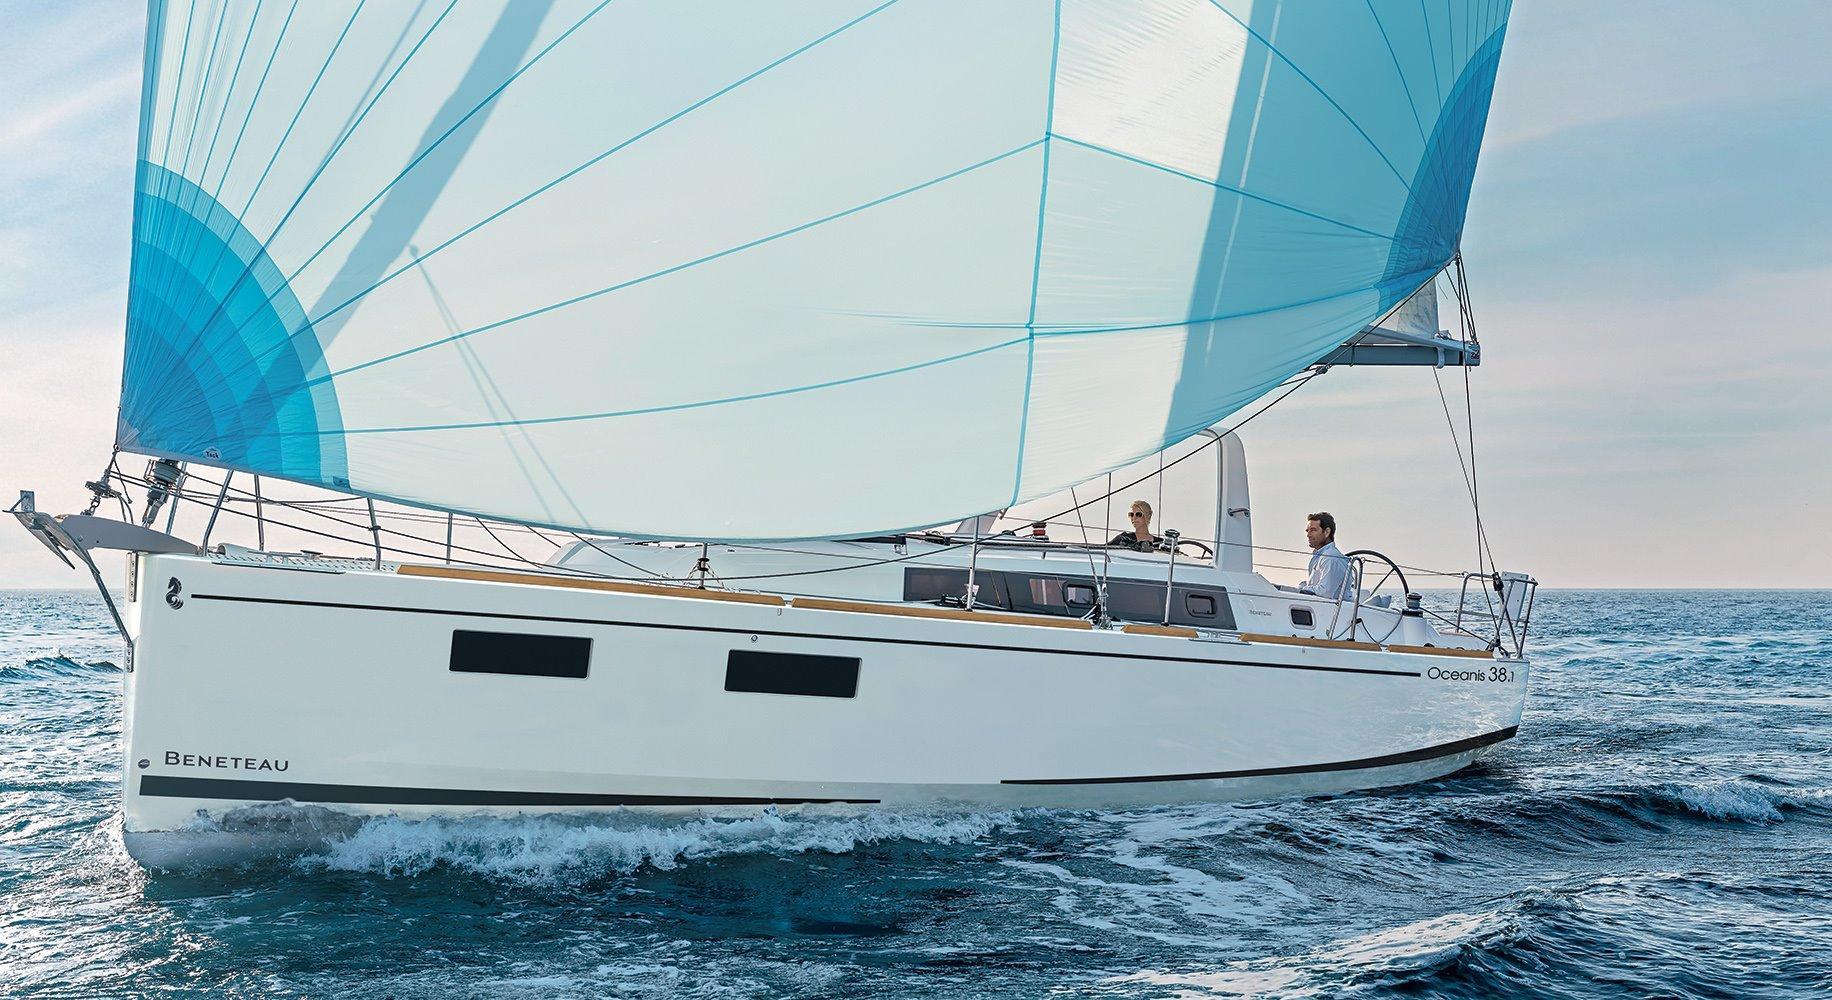 Beneteau Oceanis 38.1 - In Stock